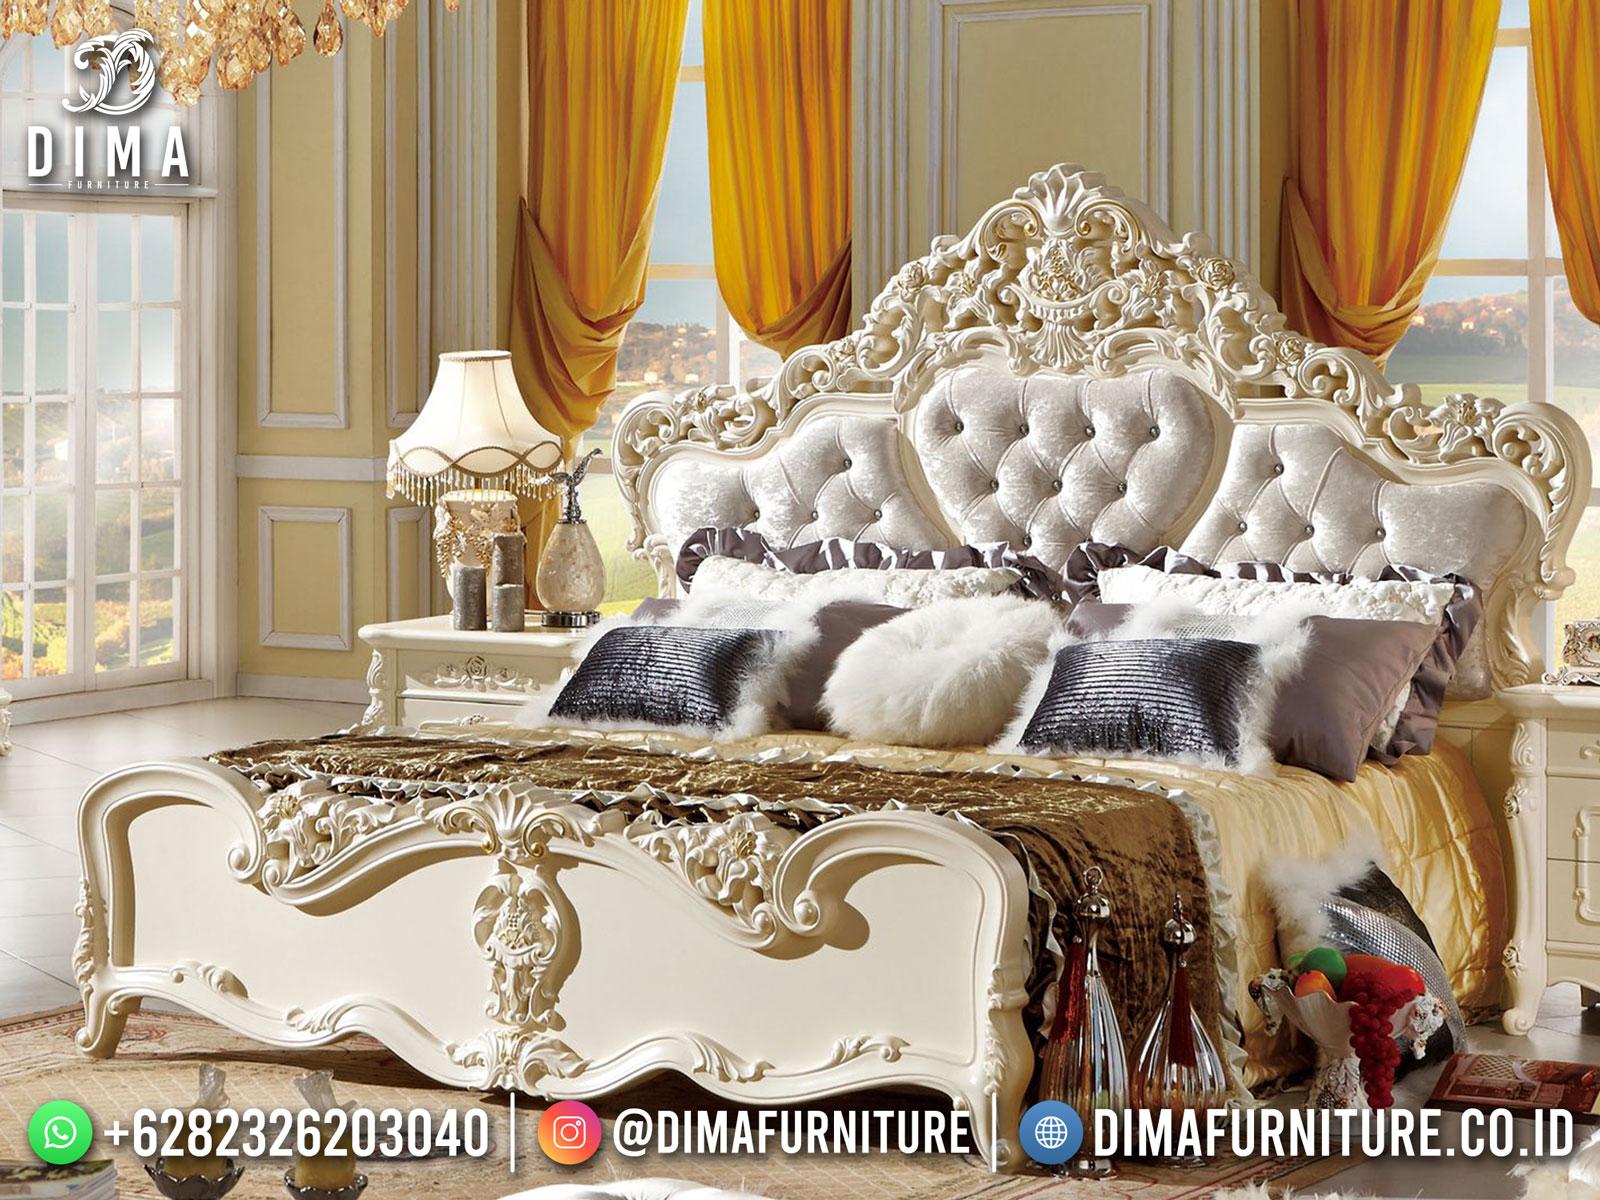 Tempat Tidur Mewah Vanesha New Luxury Carving Furniture Jepara ST-1426